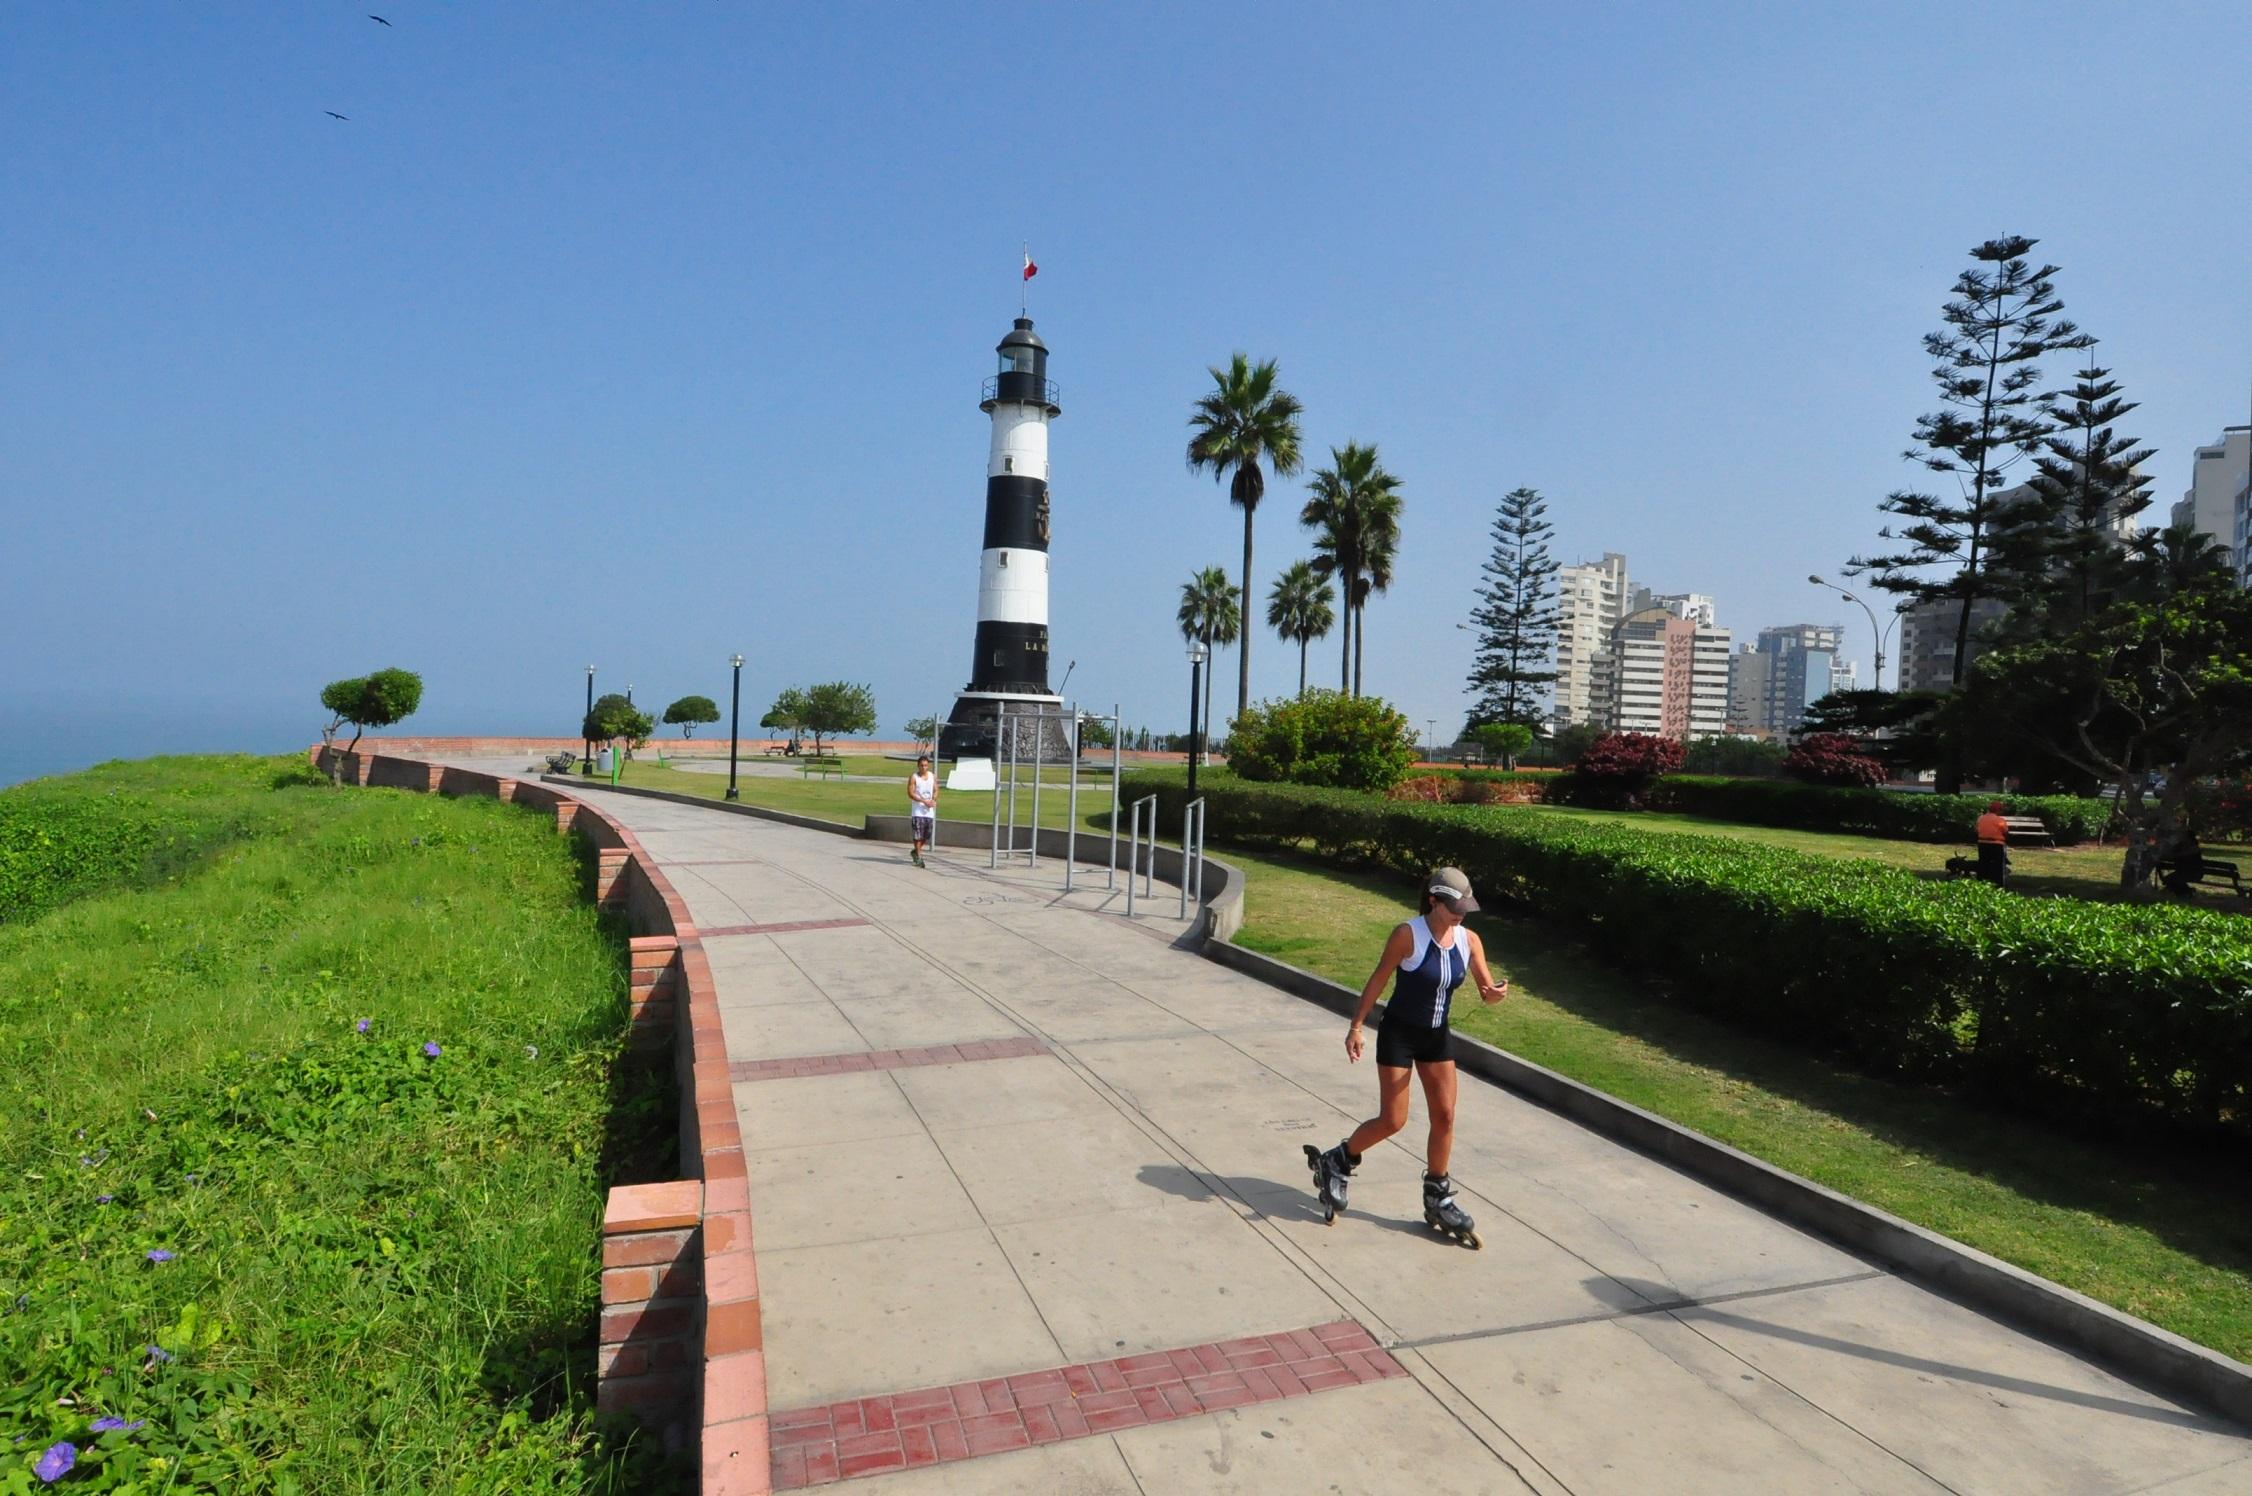 http://www.miraflores.gob.pe/Gestorw3b/files/img/9505-20625-parque-el-faro.jpg